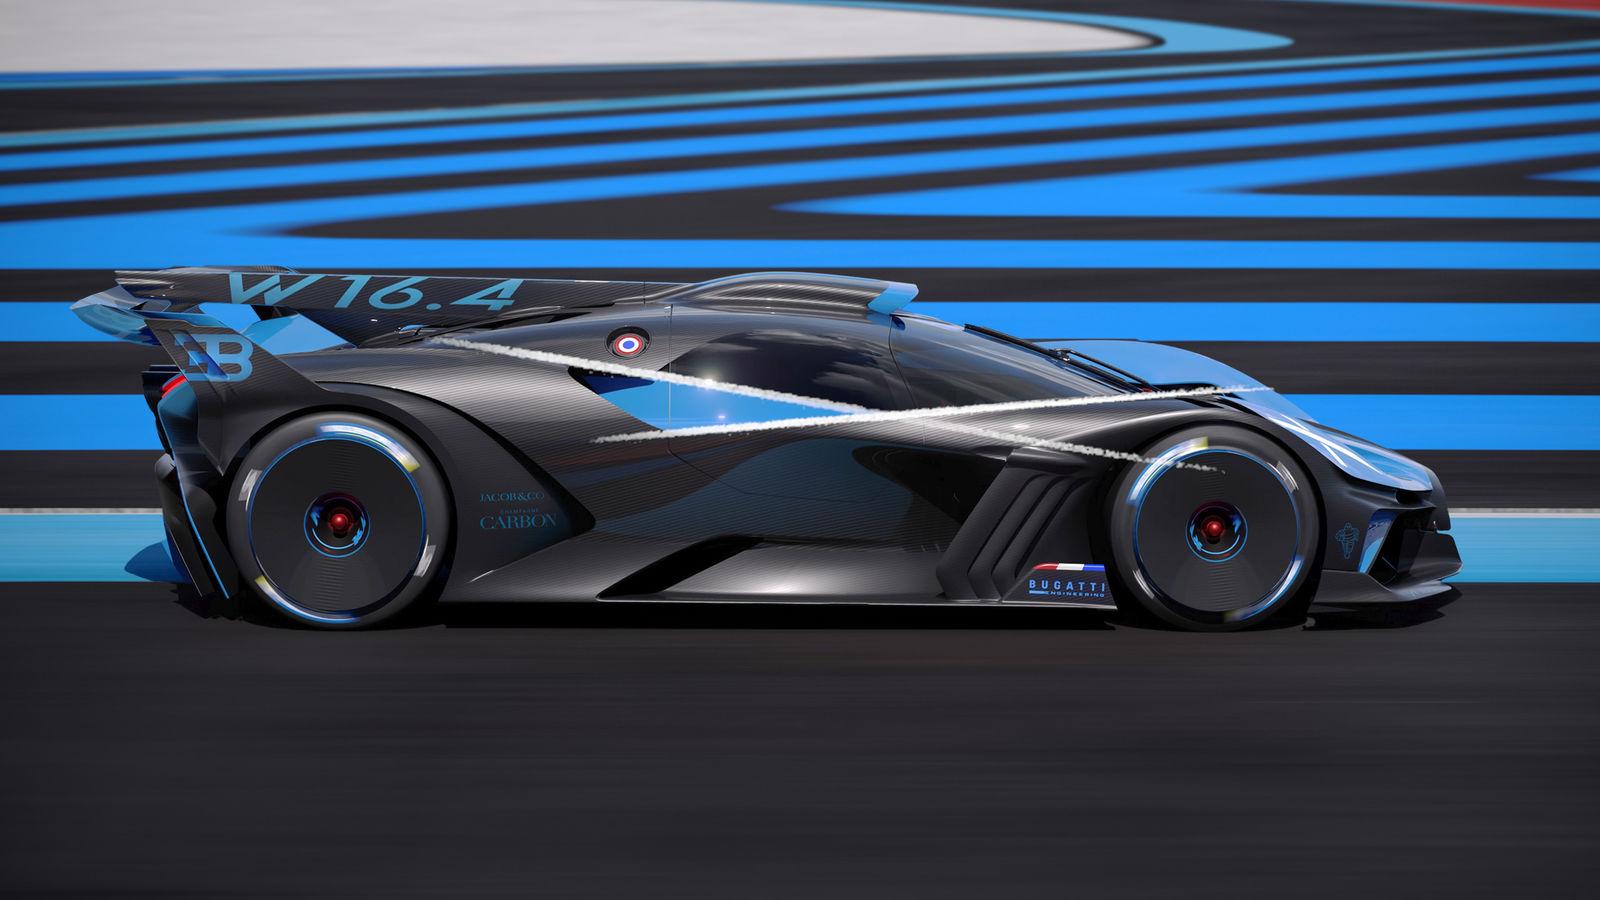 Bugatti-Bolide-concept-photos-33